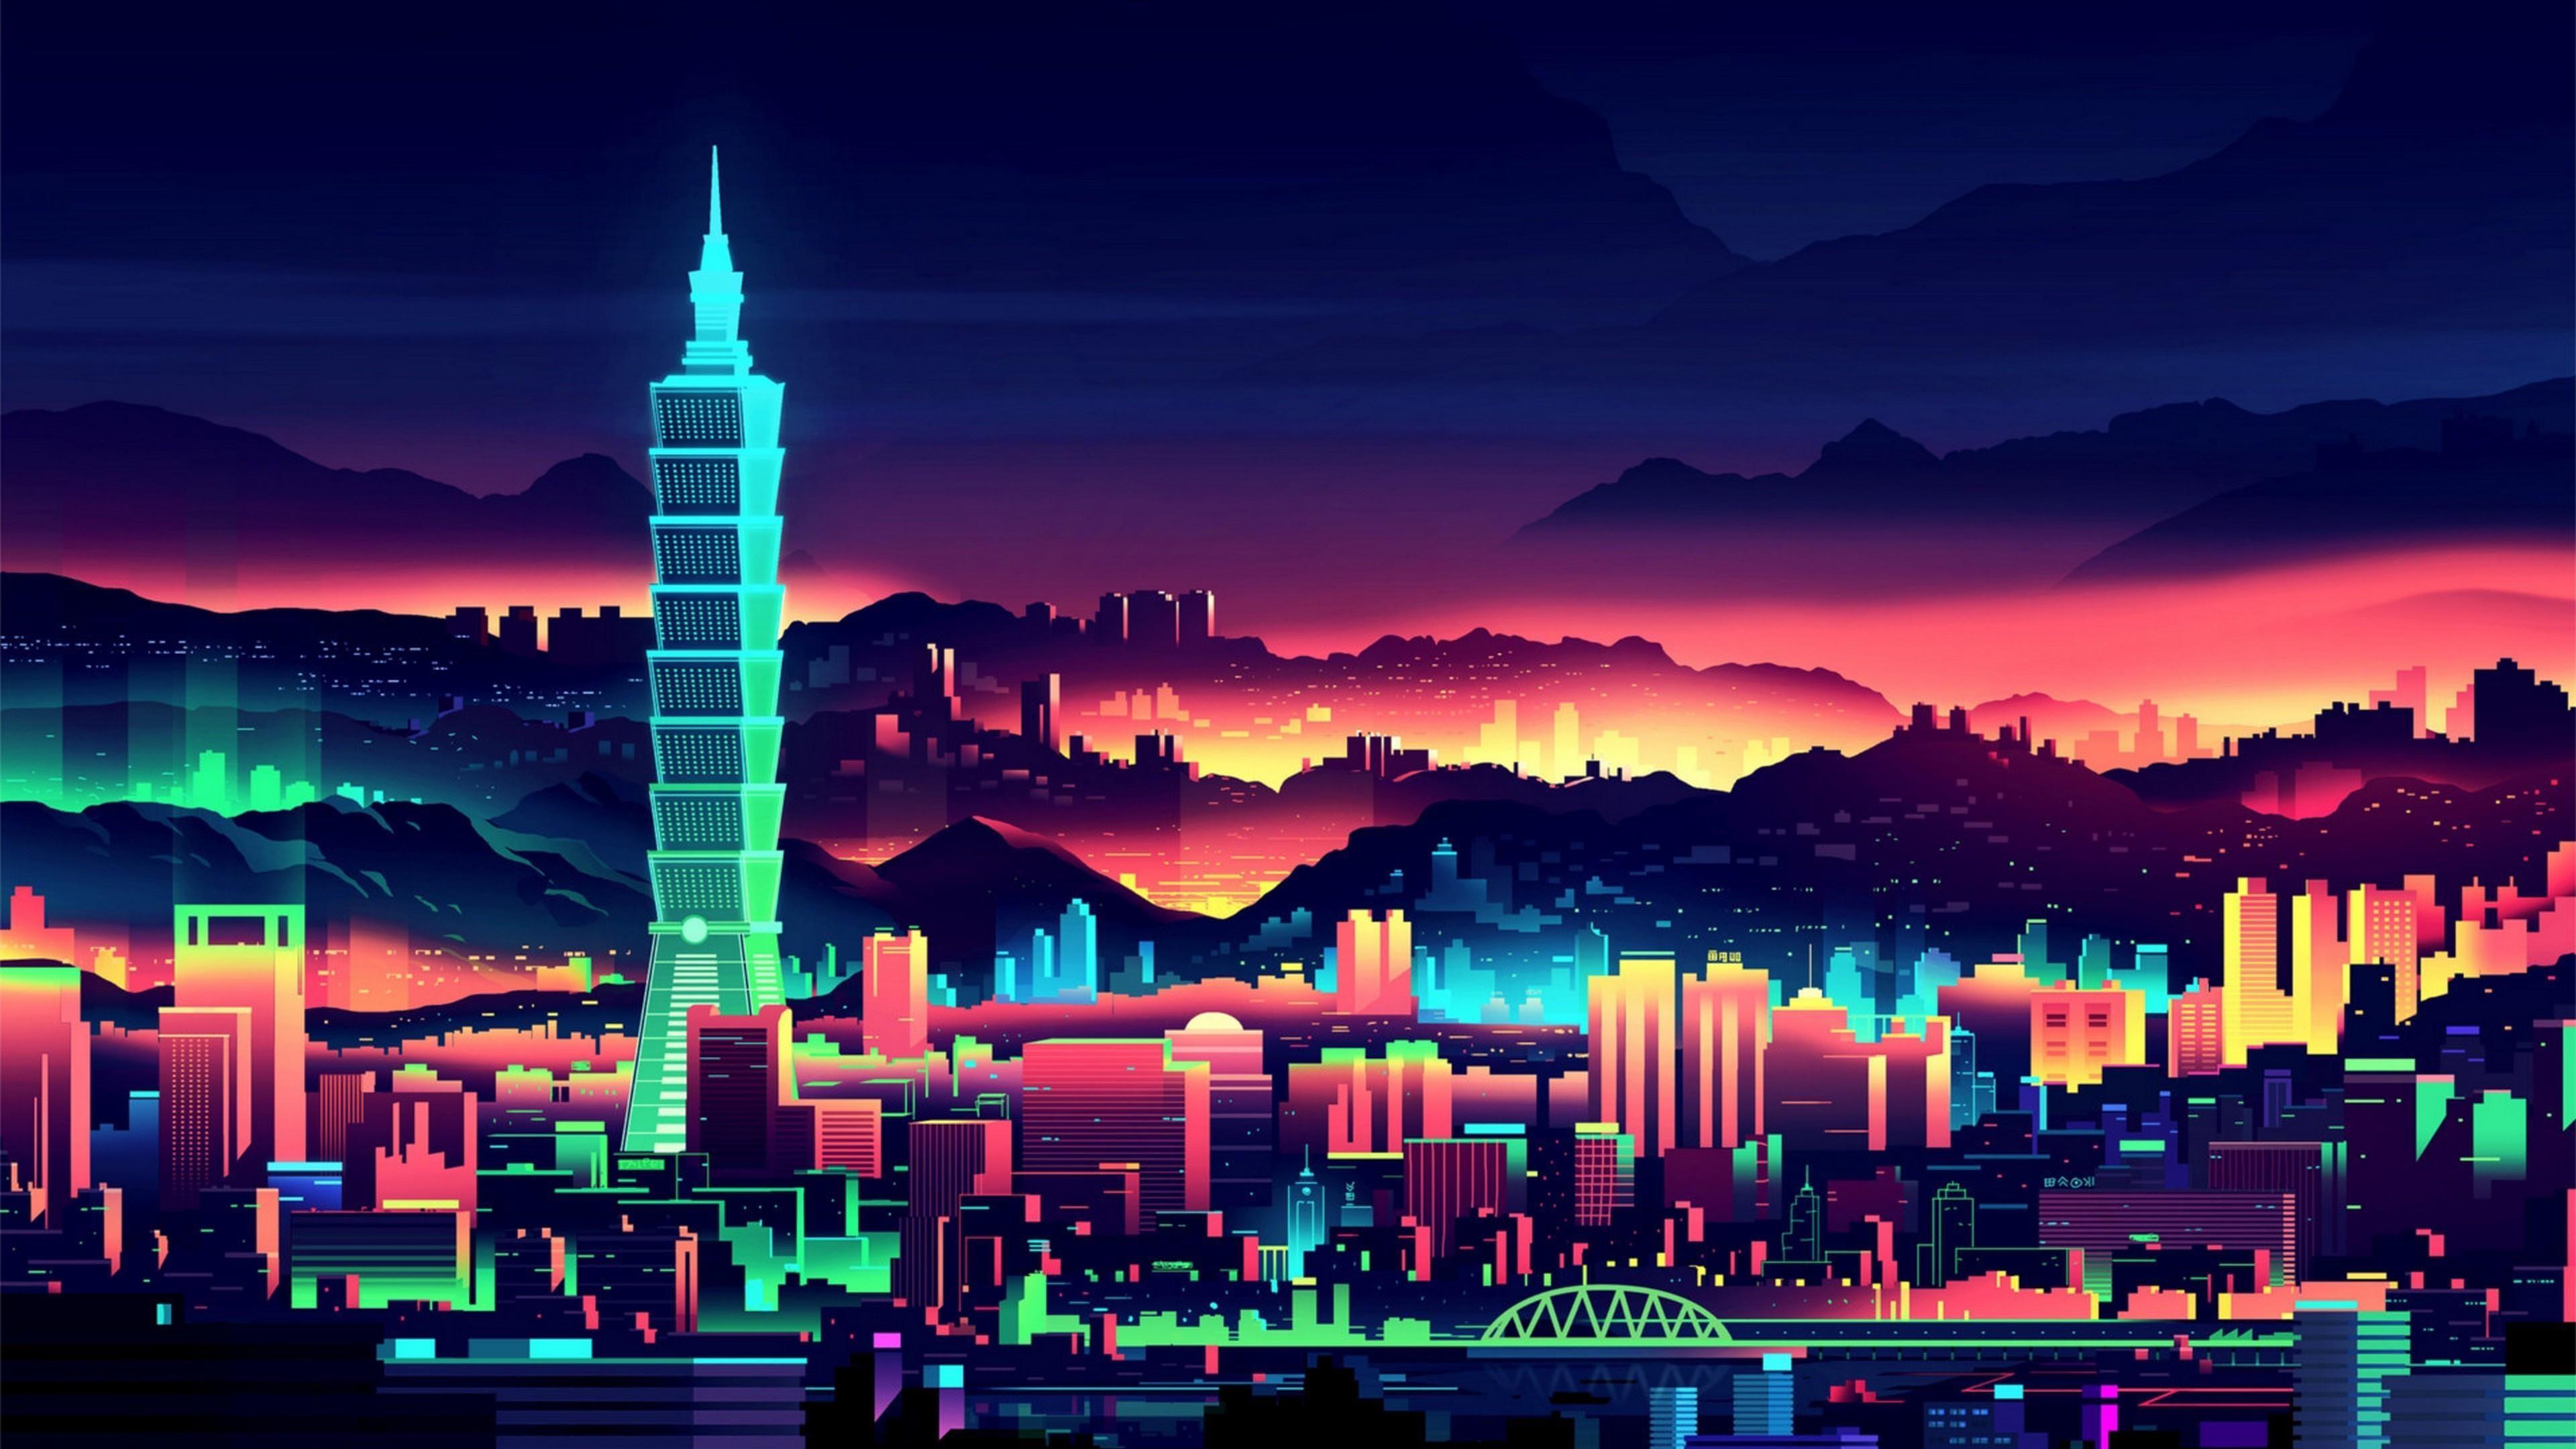 Neon Digital Art Taipei Taiwan Wallpaper Futuristic Neon Digital Ar Fondos De Pantalla Grandes Fondos Para Pc Tumblr Descargar Fondos De Pantalla Para Pc